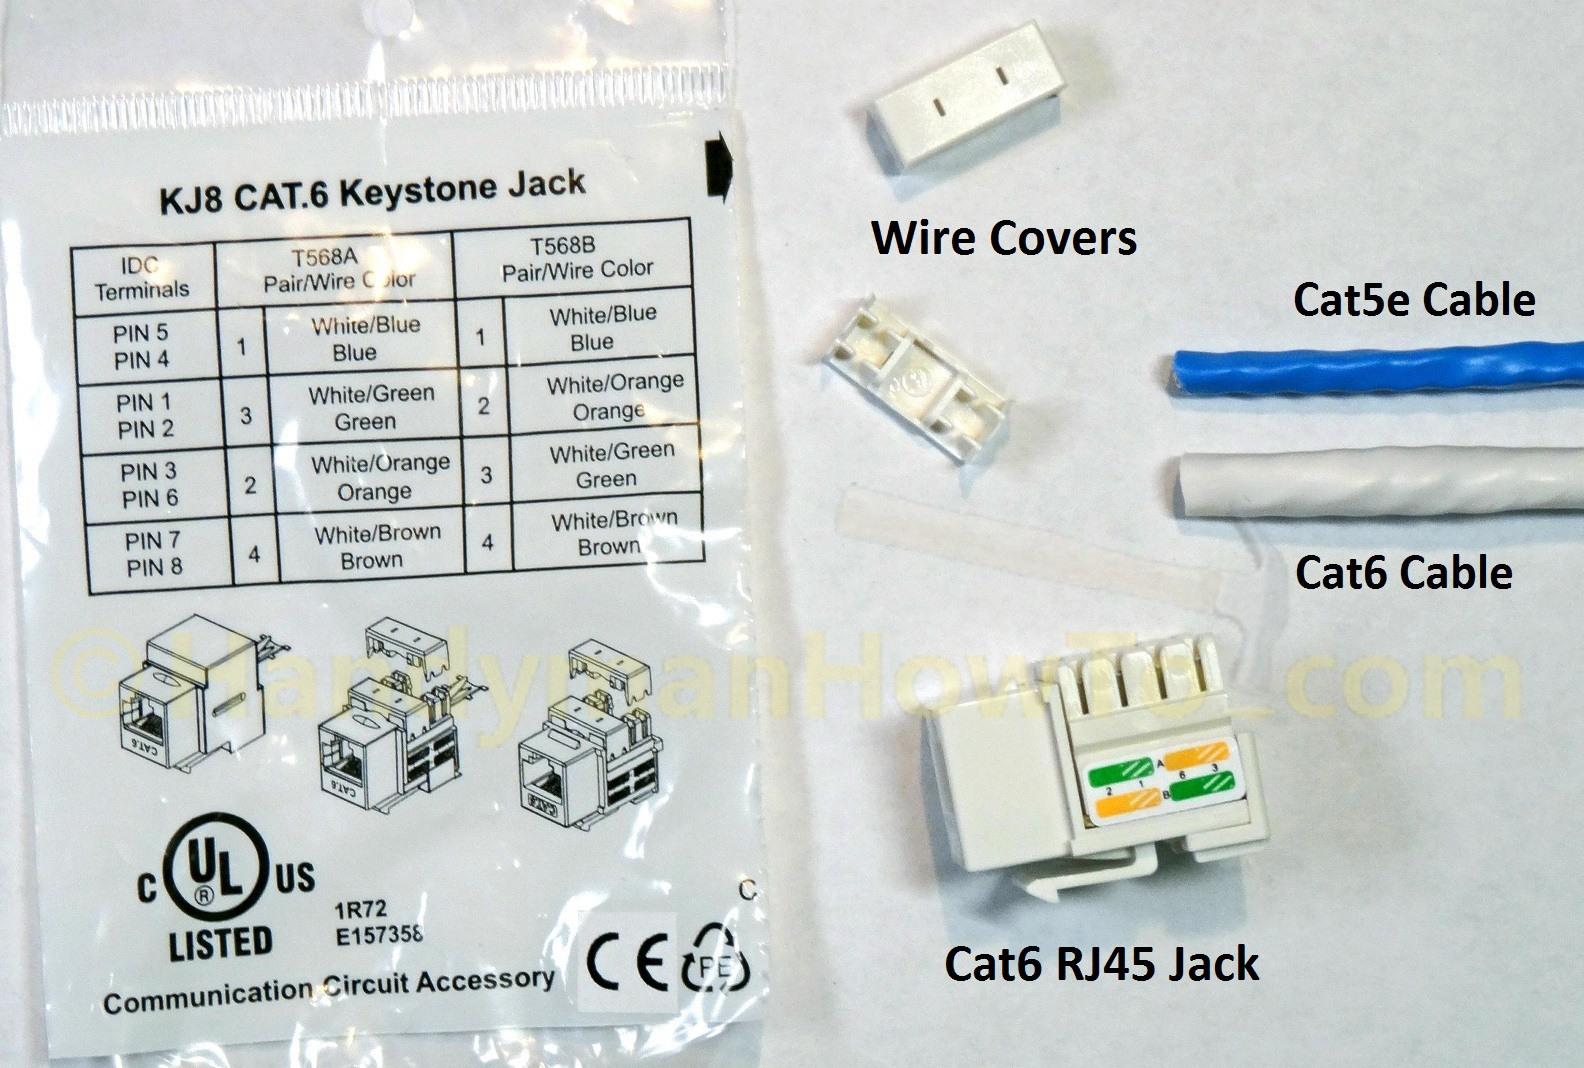 Cat6 Keystone Jack Wiring Diagram - Today Wiring Diagram - Cat6 Keystone Jack Wiring Diagram